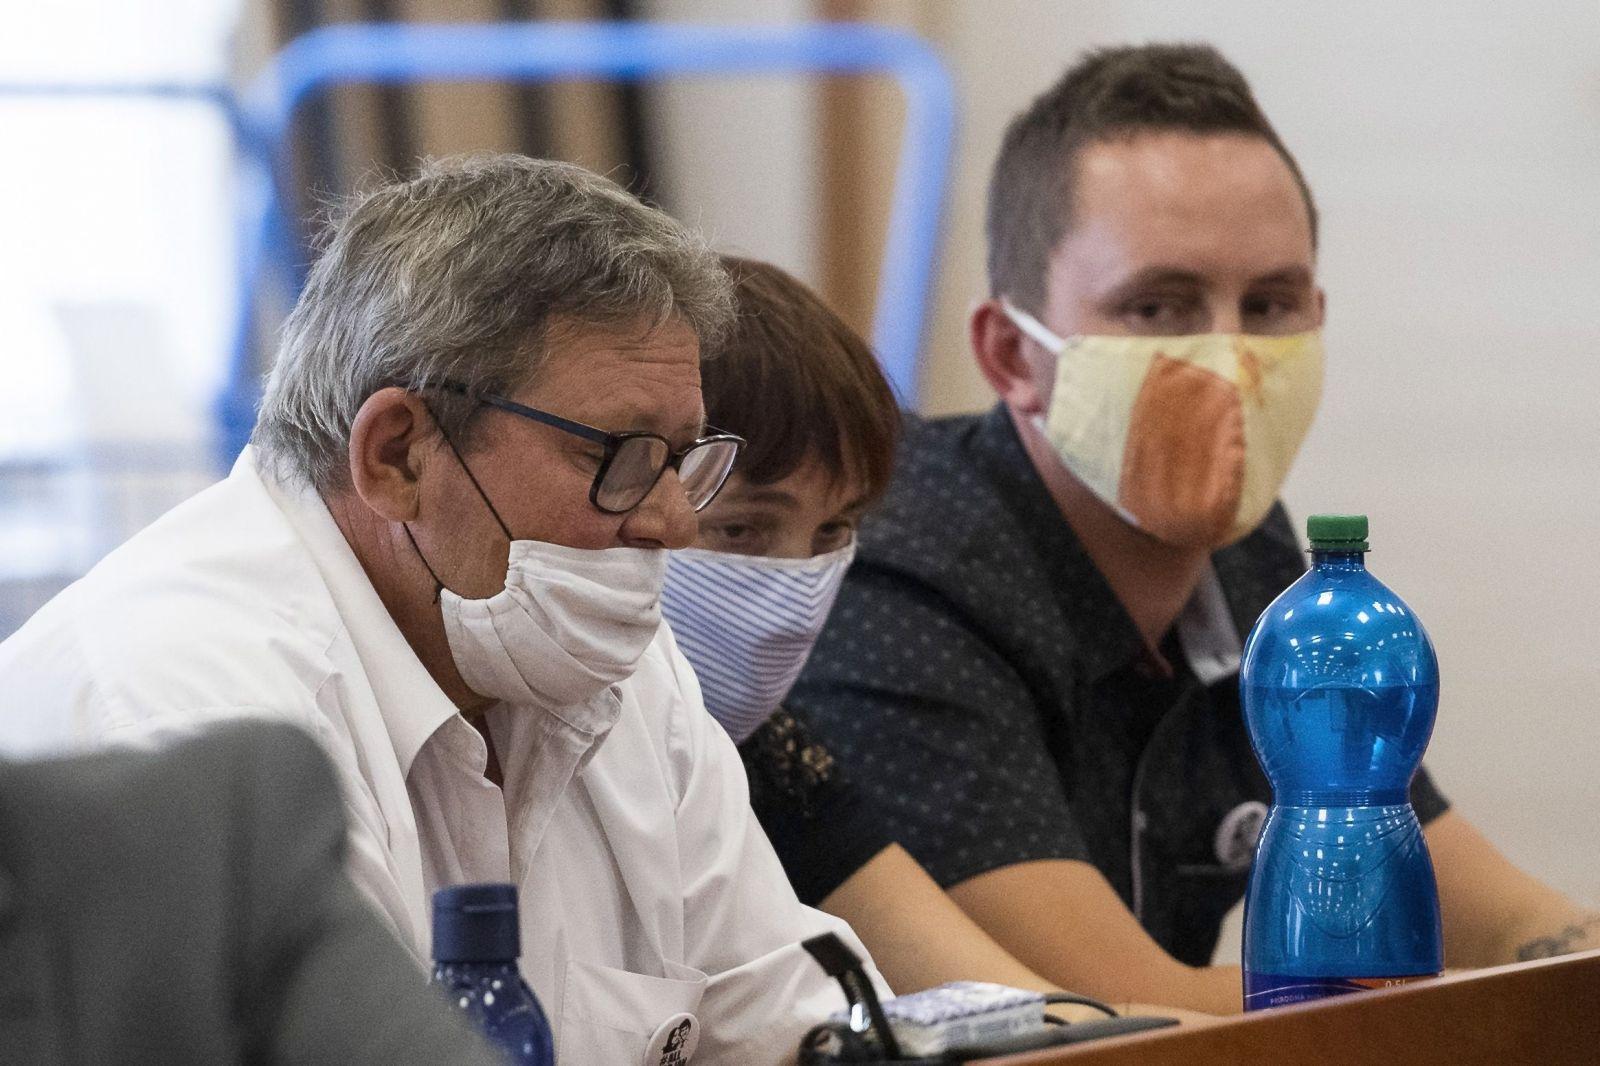 Na snímke zľava rodičia Jána Kuciaka Jozef a Jana Kuciakovci a brat Jozef Kuciak počas hlavného pojednávania v kauze vraždy Jána Kuciaka a Martiny Kušnírovej na Špecializovanom trestnom súde v Pezinku 23. júla 2020.